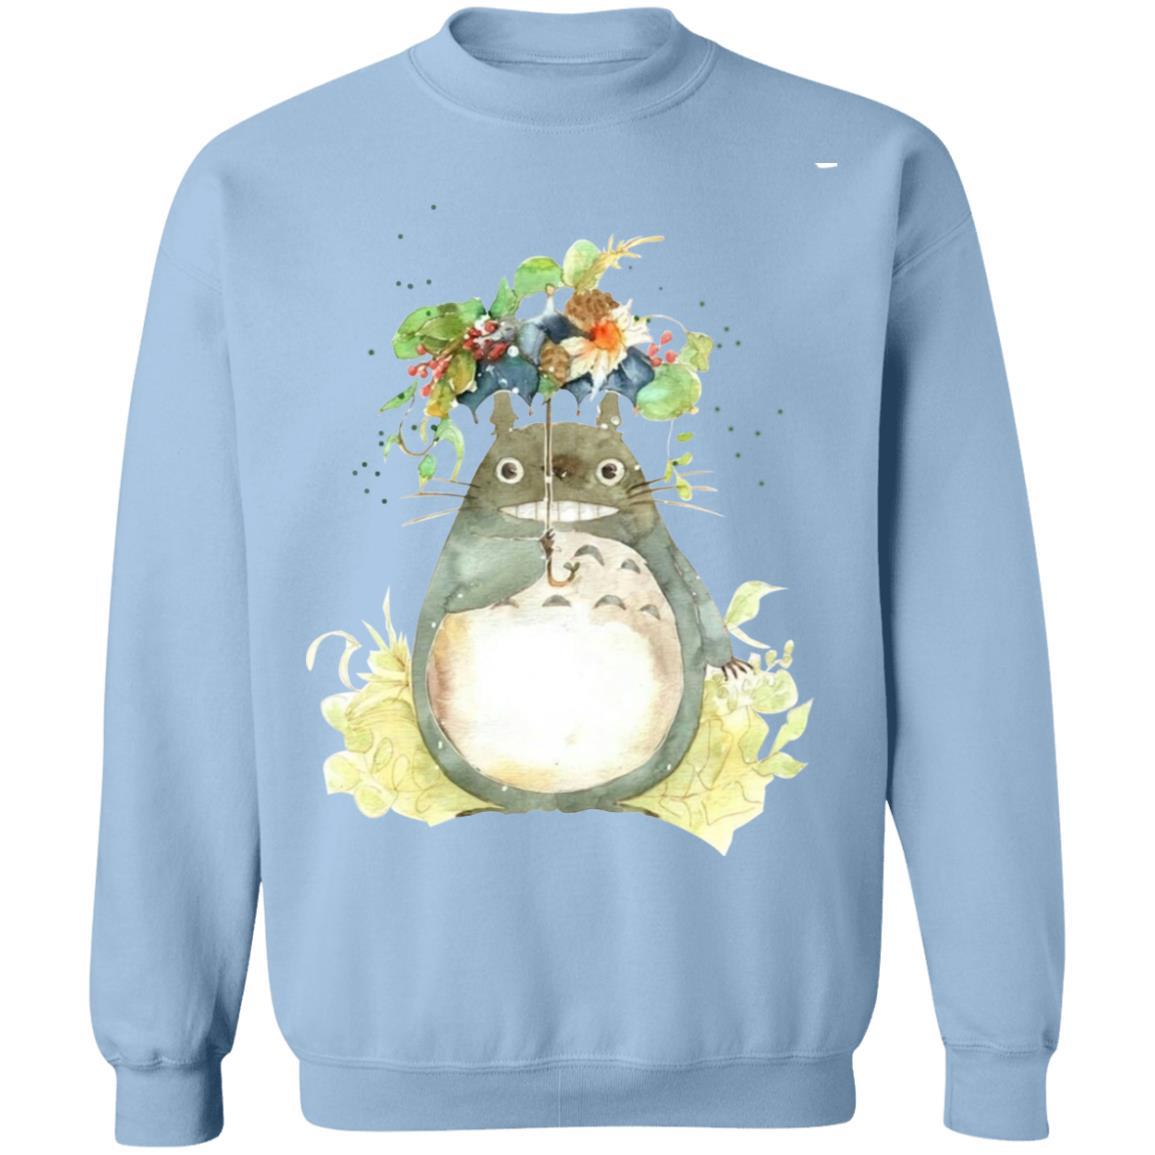 Totoro with Flower Umbrella Sweatshirt